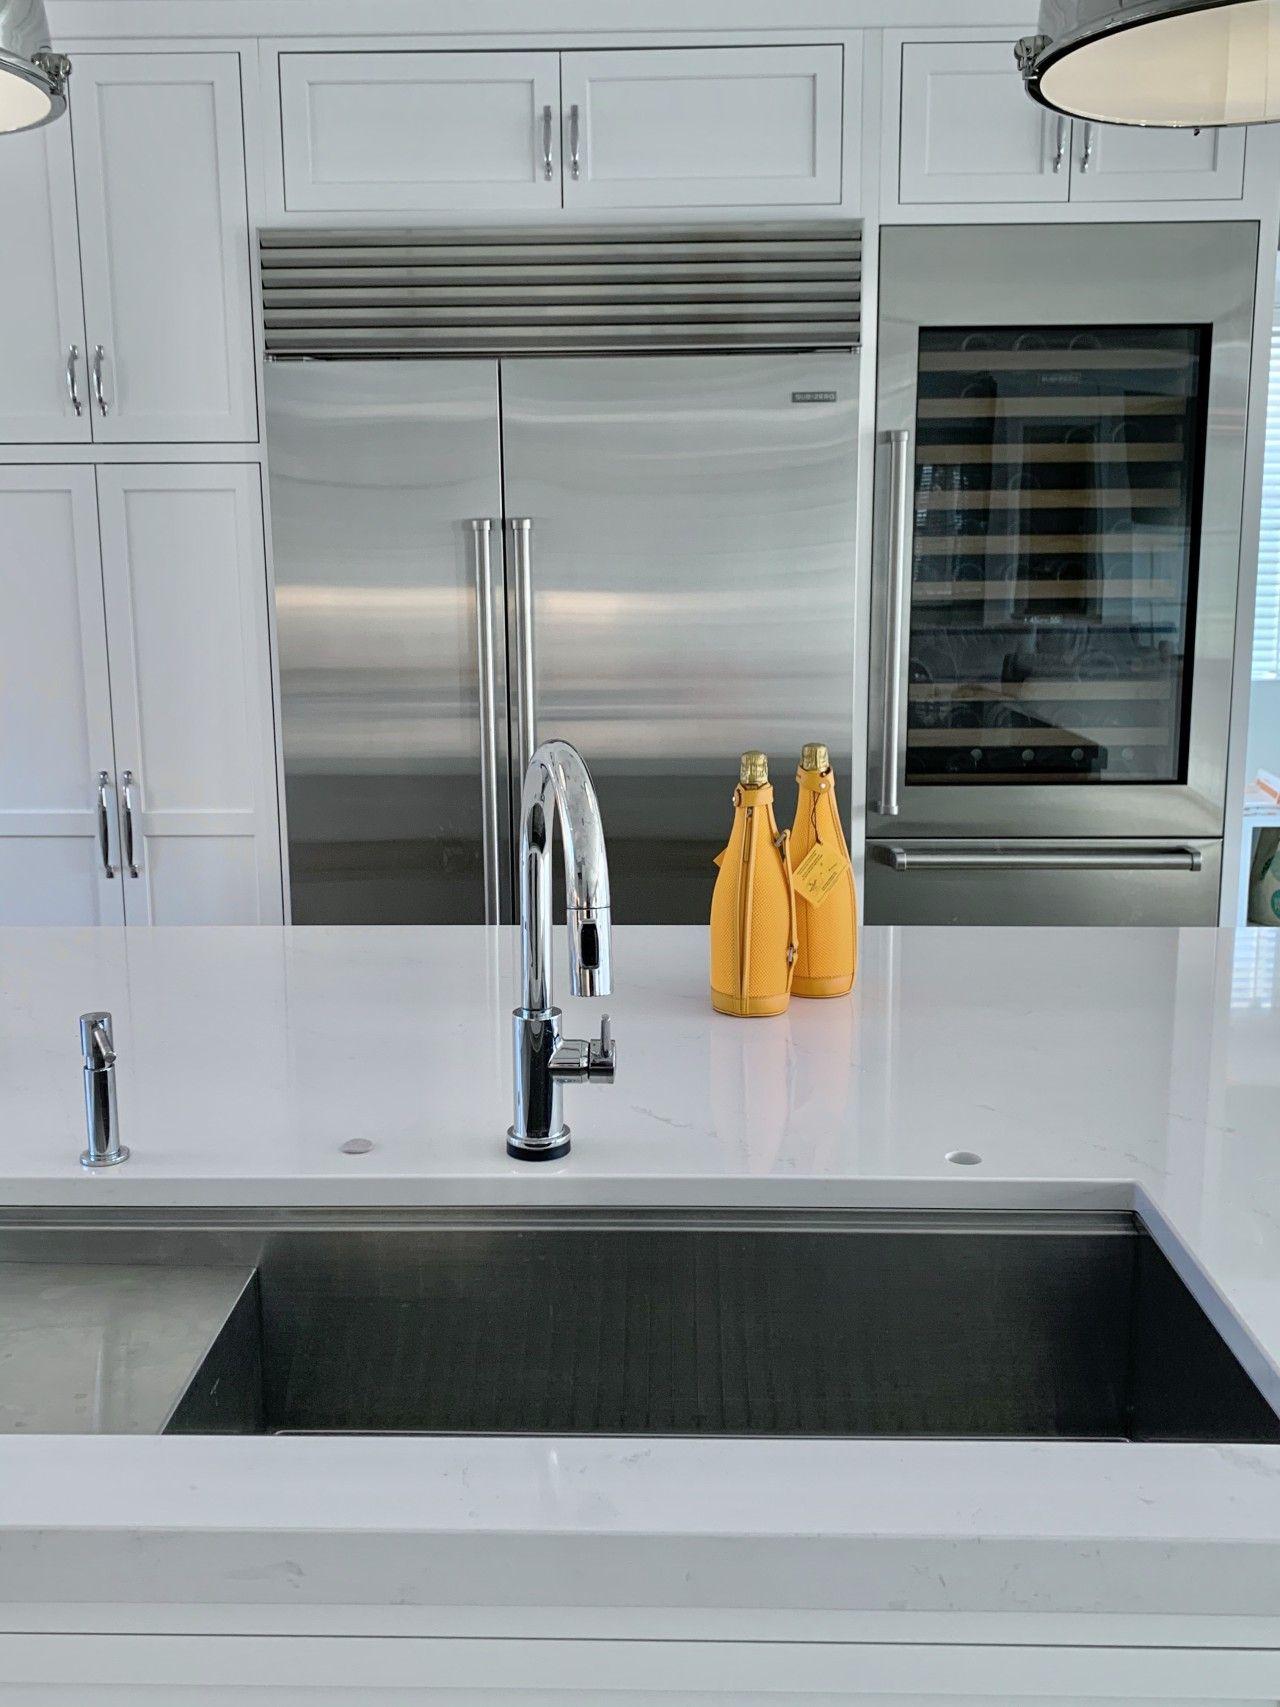 Is a SubZero Refrigerator Worth the Money? (Prices